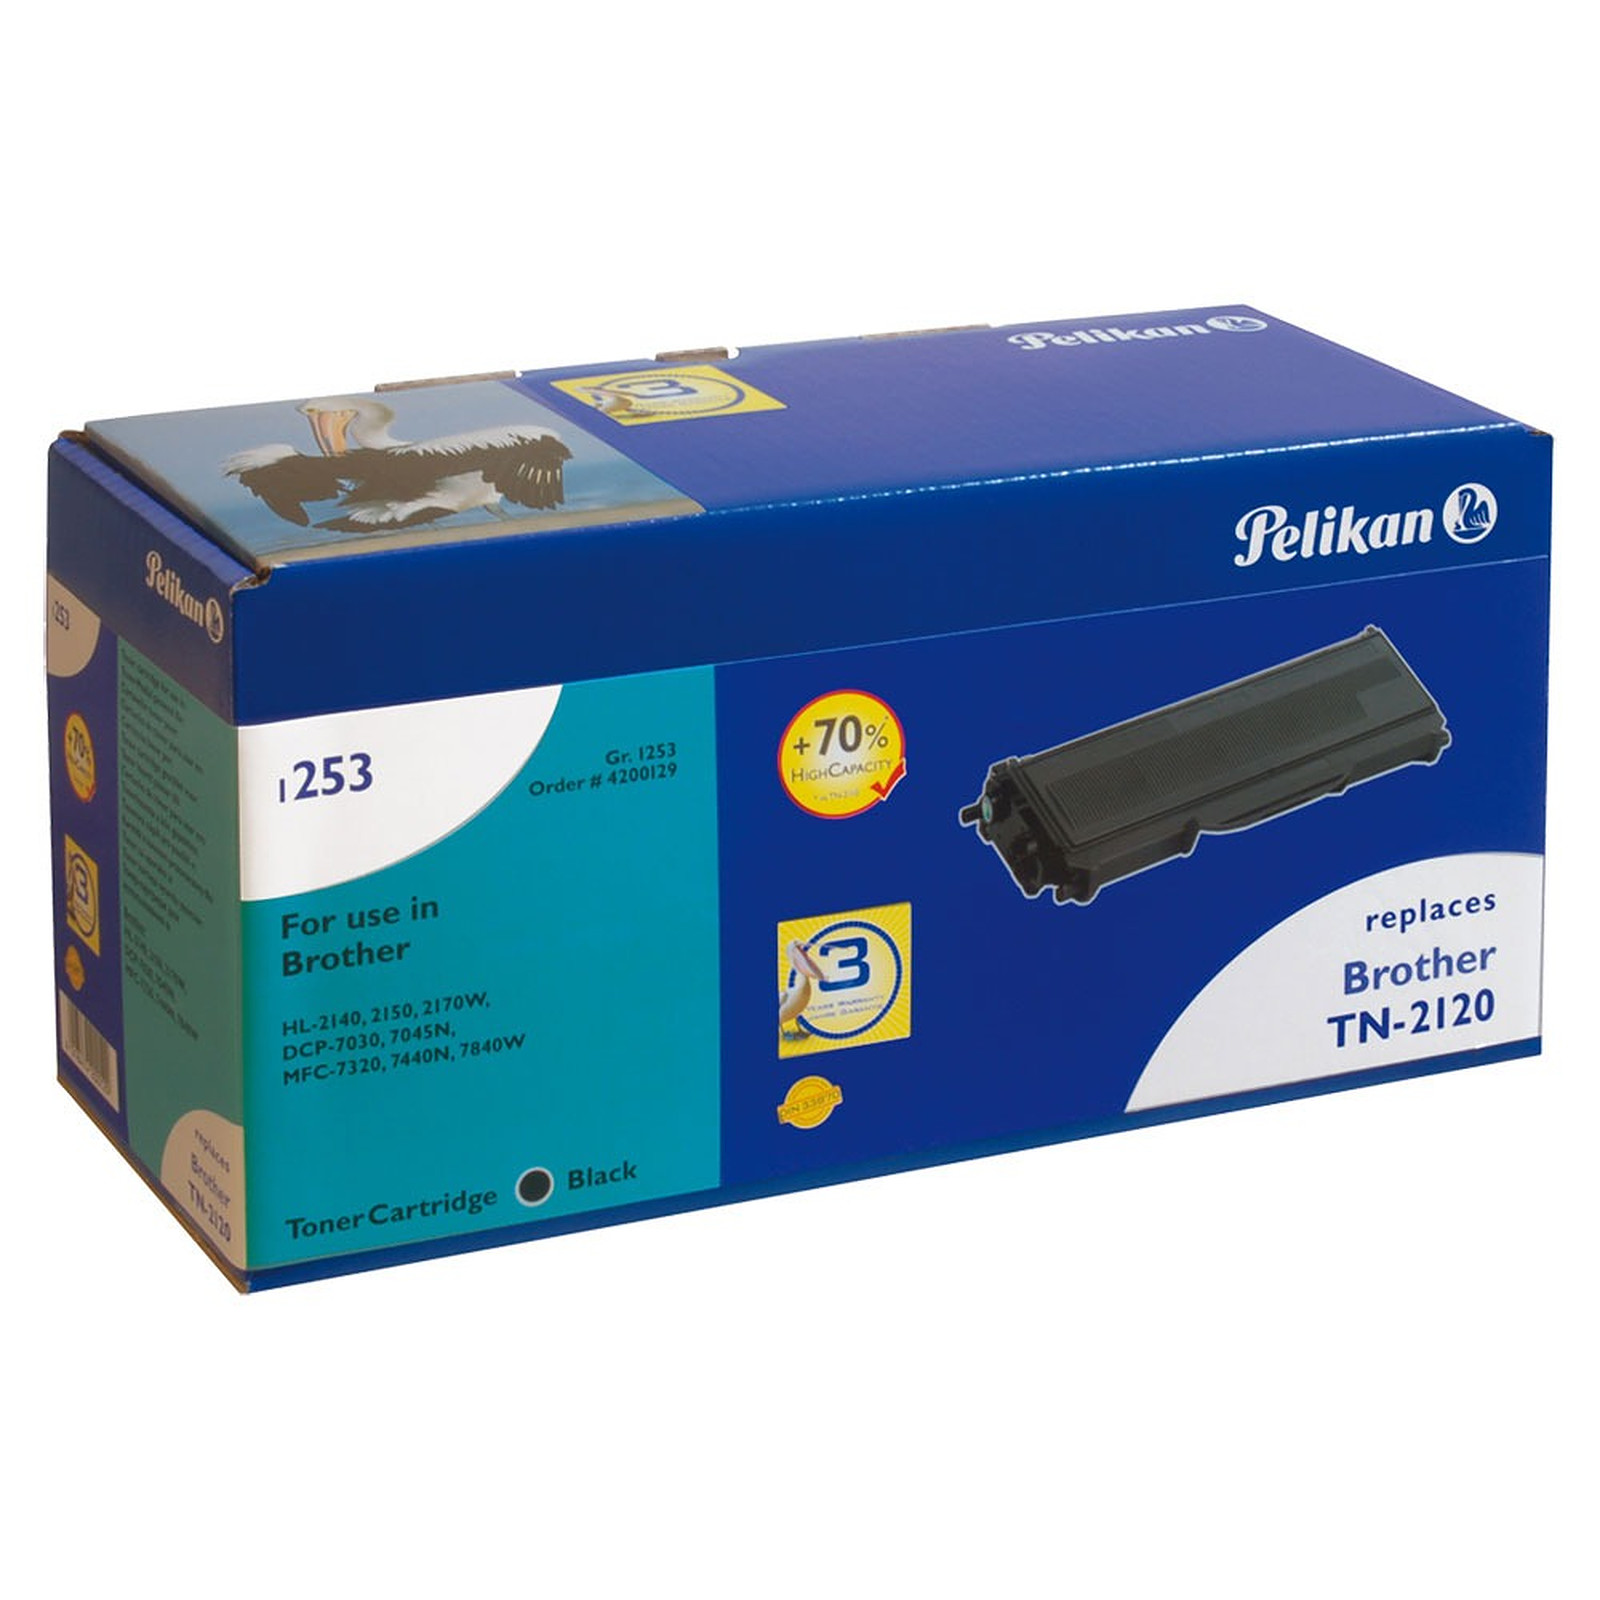 Pelikan toner compatible TN-2120 (Noir) + PeliCARE